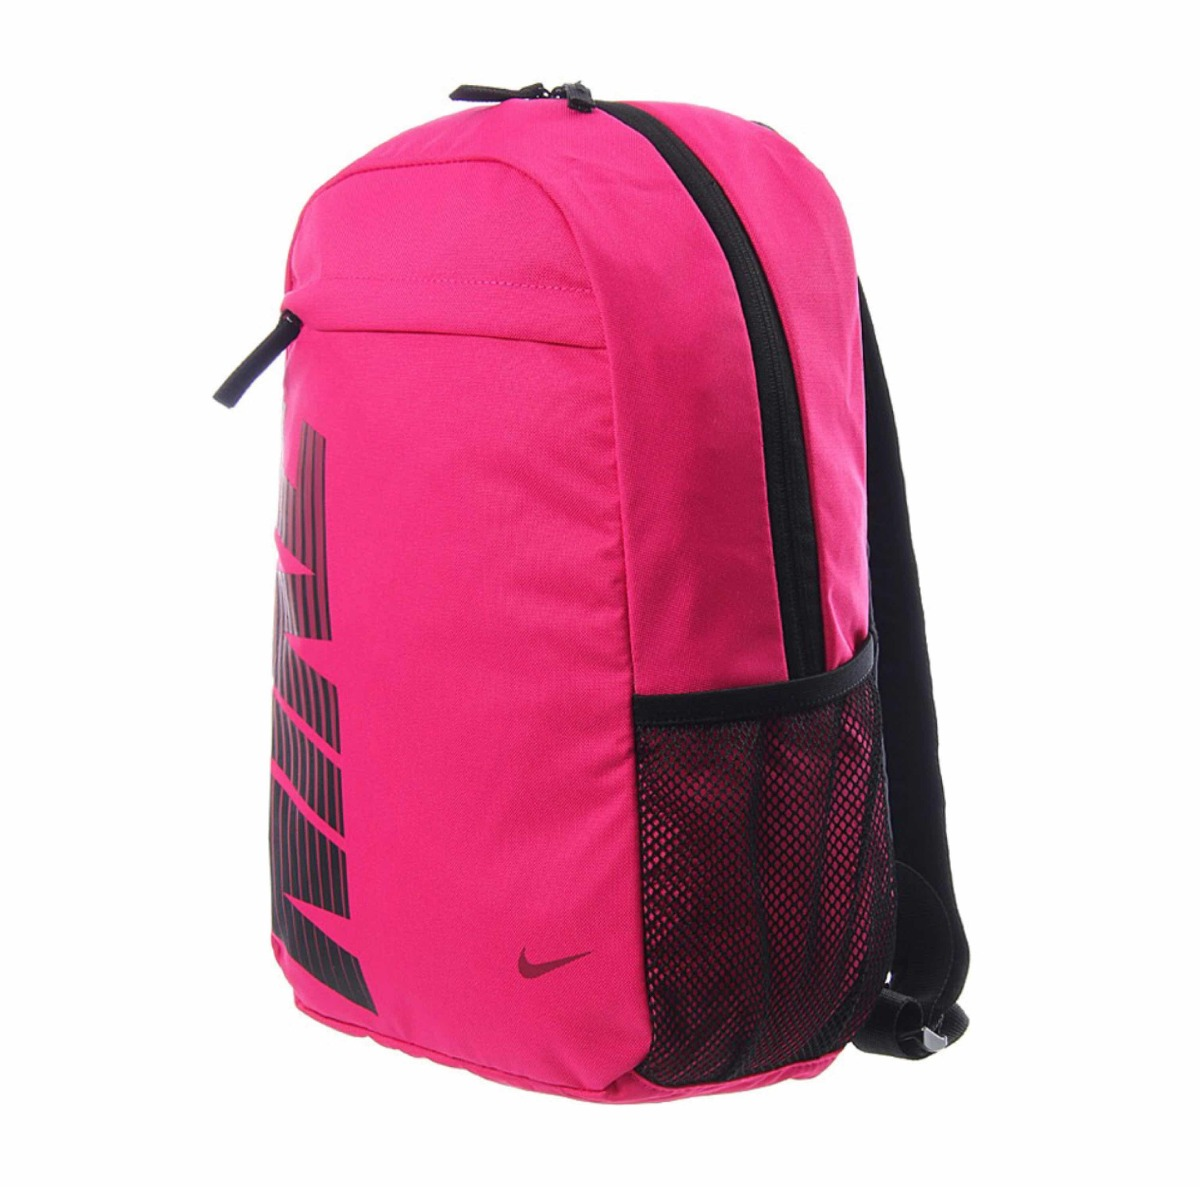 Zoom Cargando Backpack Nike Rosa Mochila qFw8aIxR